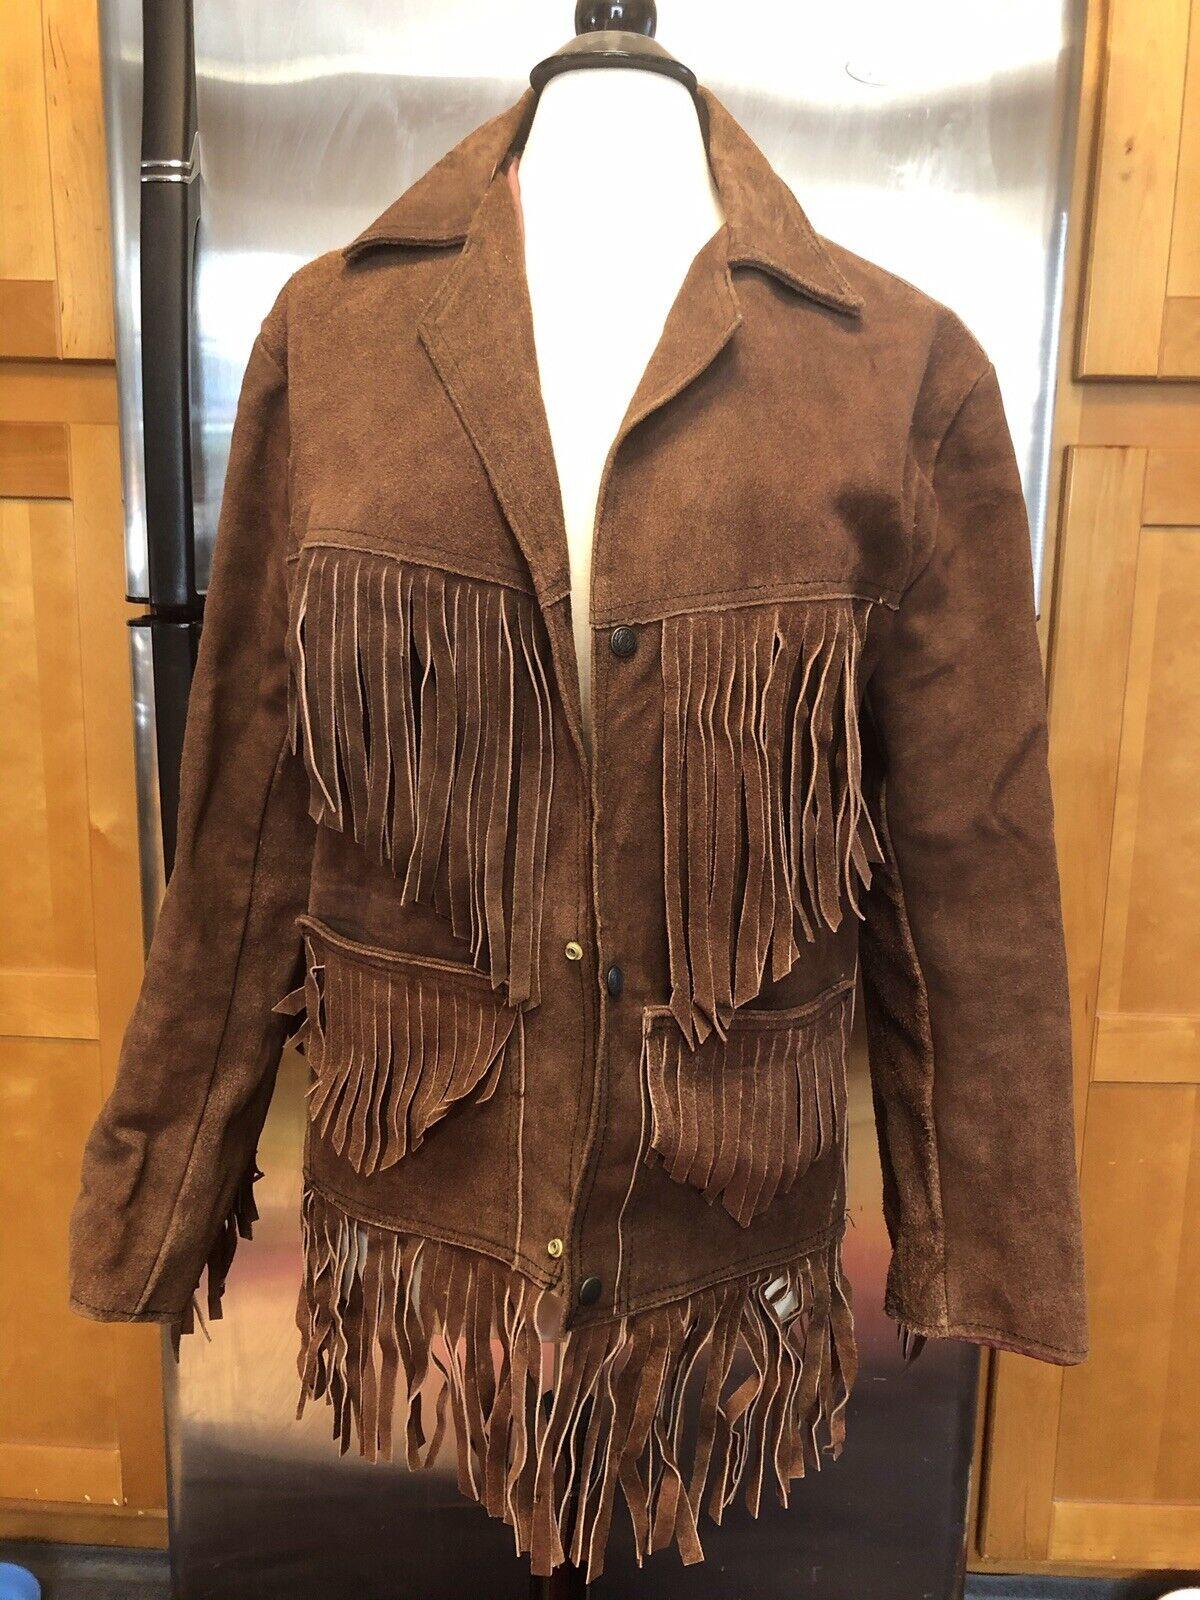 Vintage Creaciones Suede Leather Fringe Jacket Coat Sz 38 Hippie Boho Western